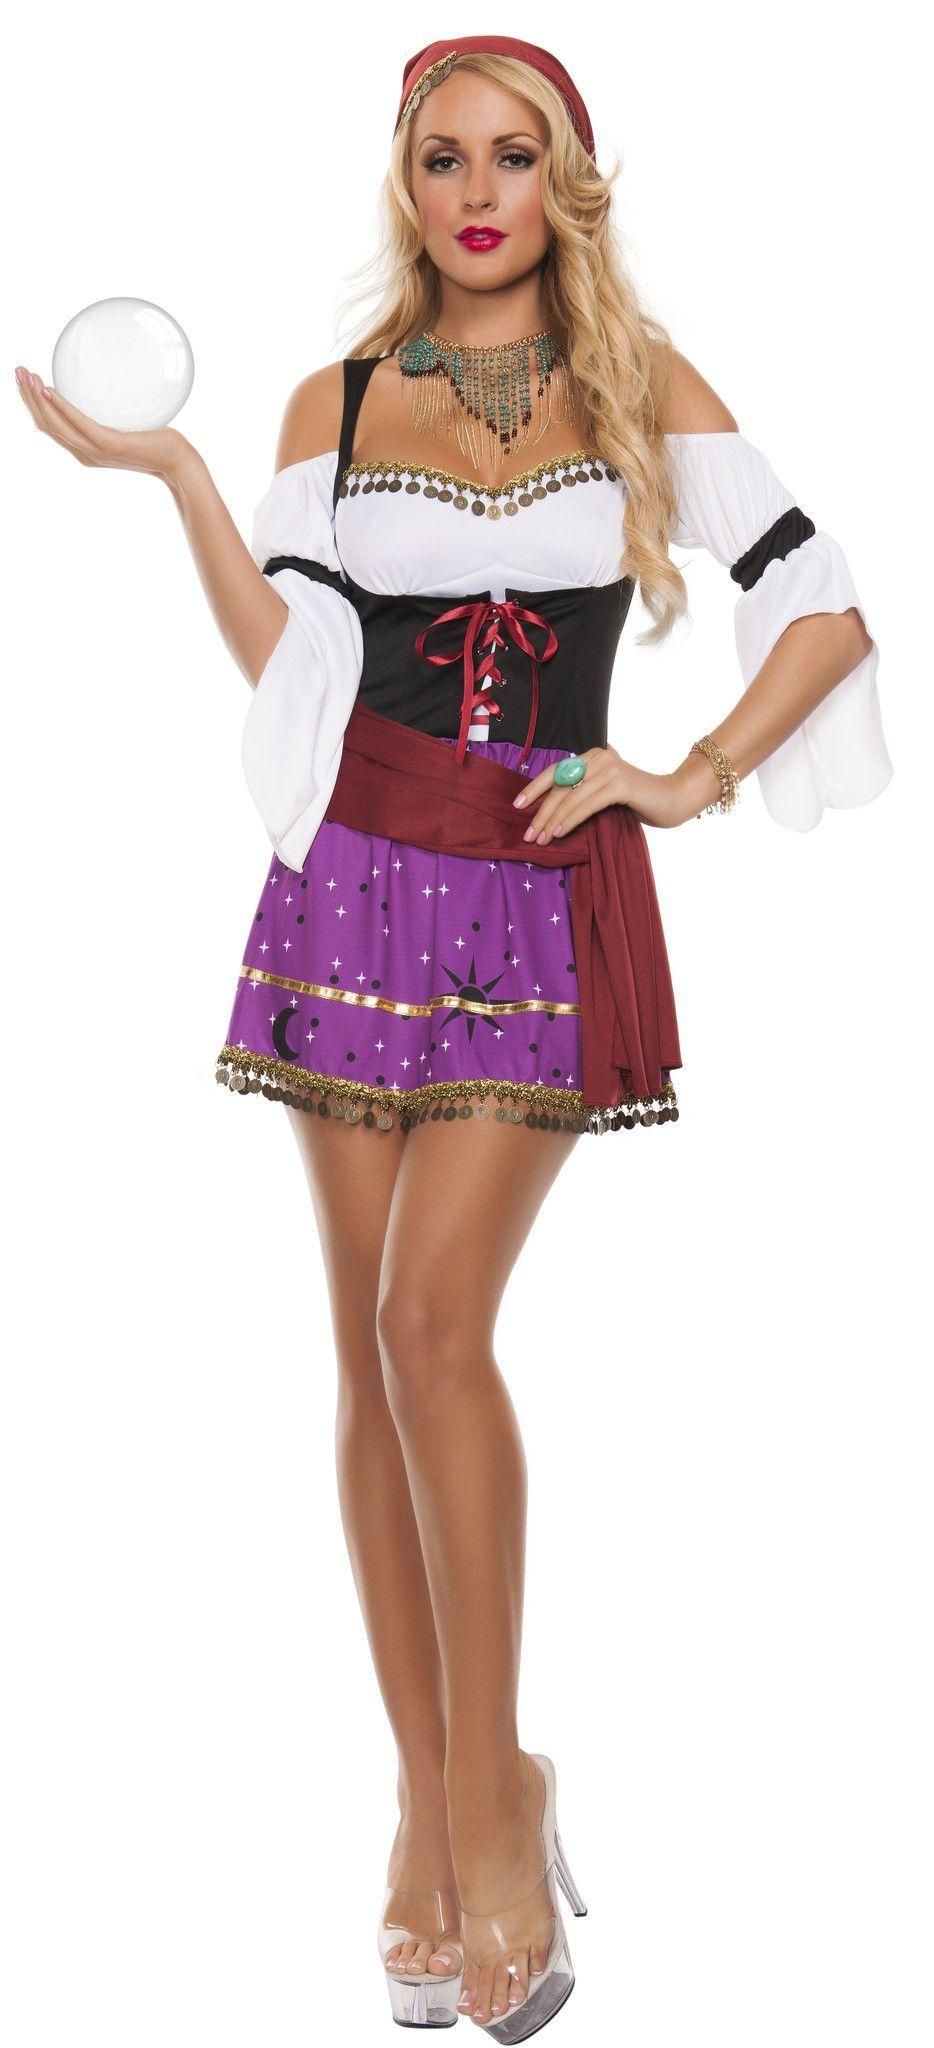 fortune teller costume | Sexy Fortune Teller Gypsy Costume ...